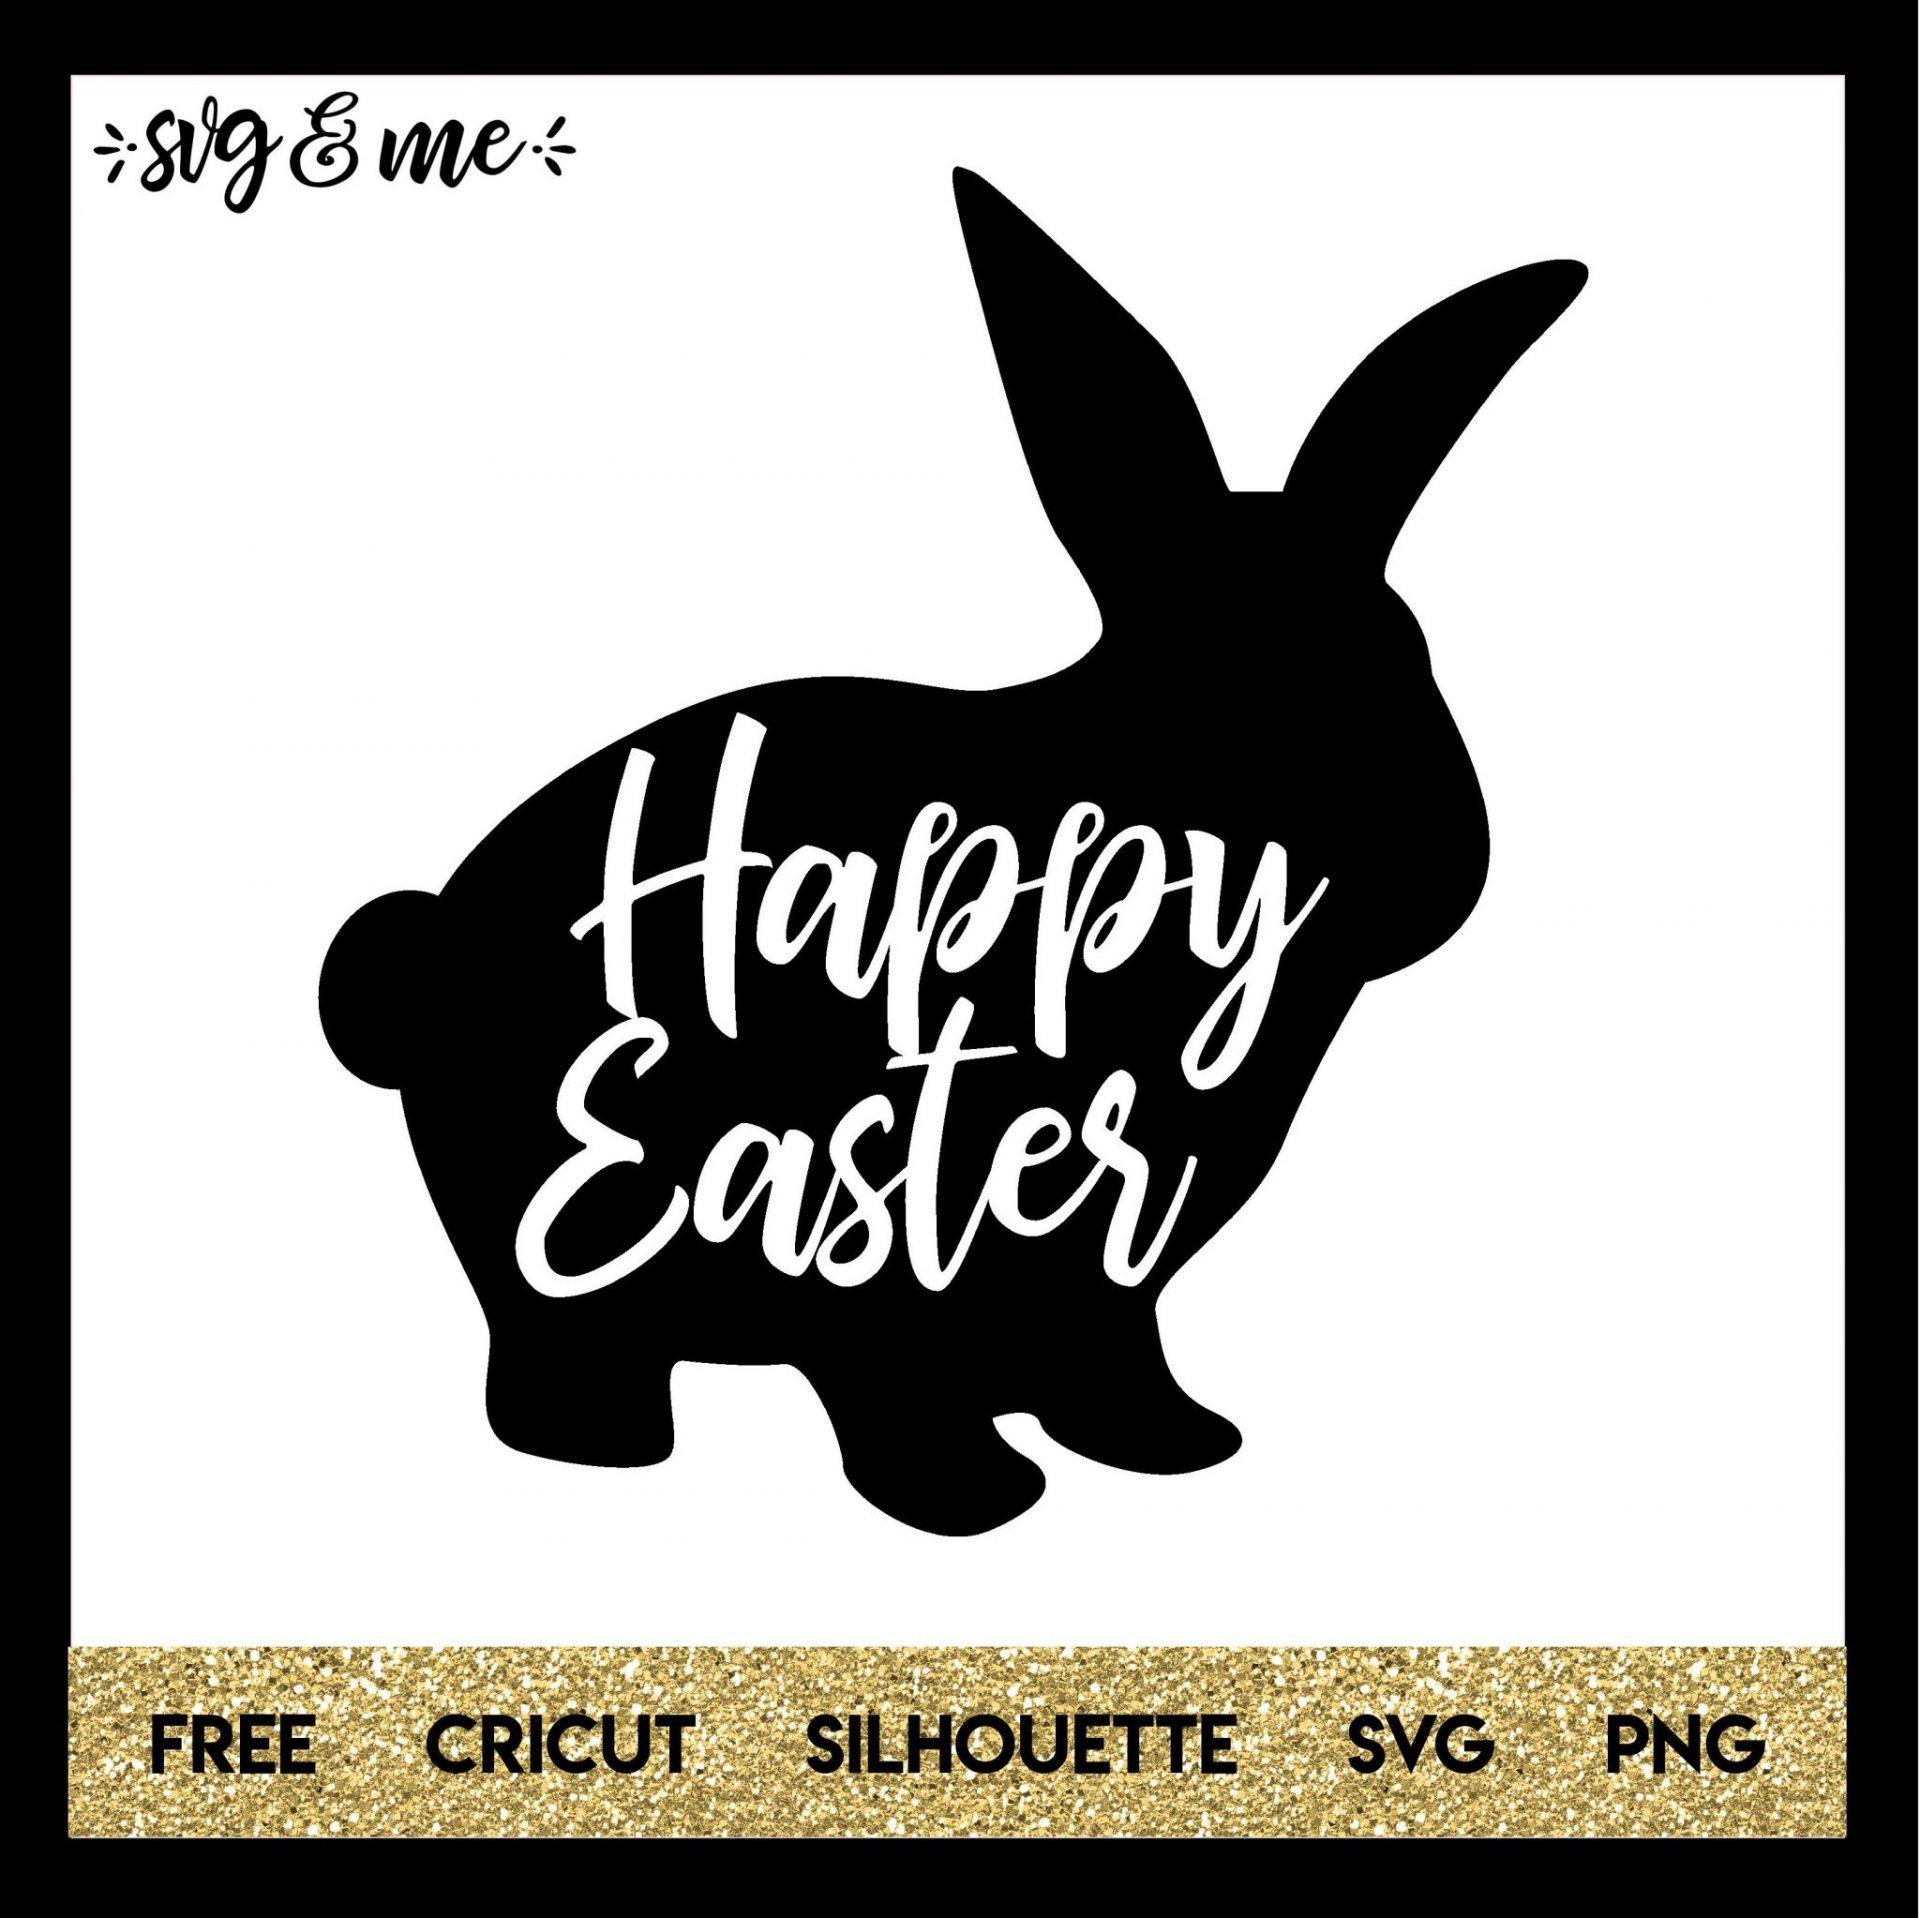 Download Free Happy Easter Bunny SVG - SVG & Me